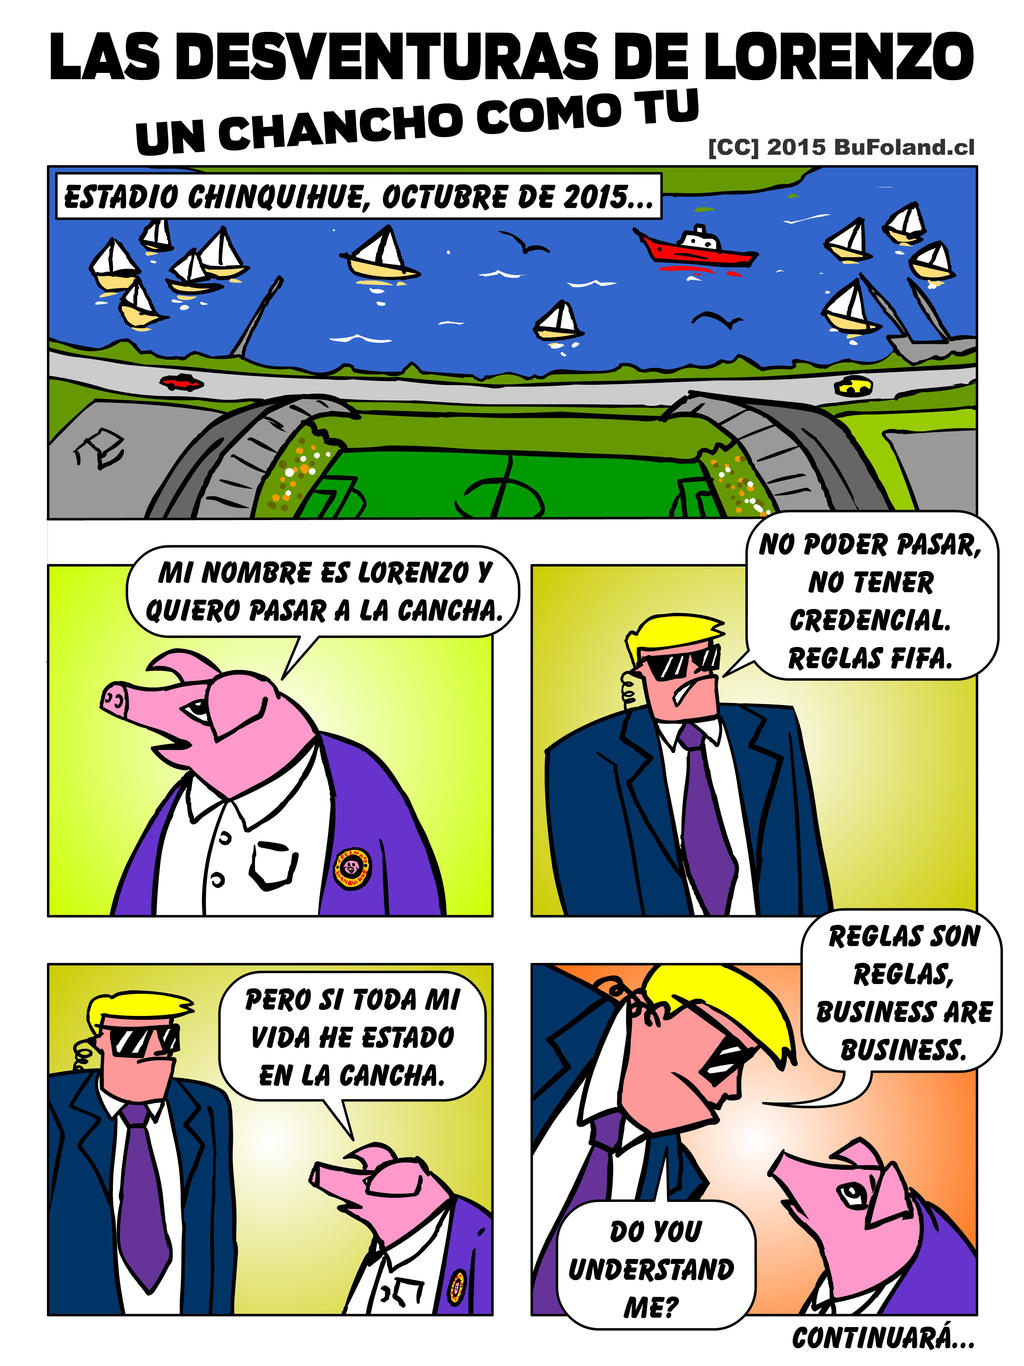 Las Desventuras de Lorenzo, un Chancho como tu 01